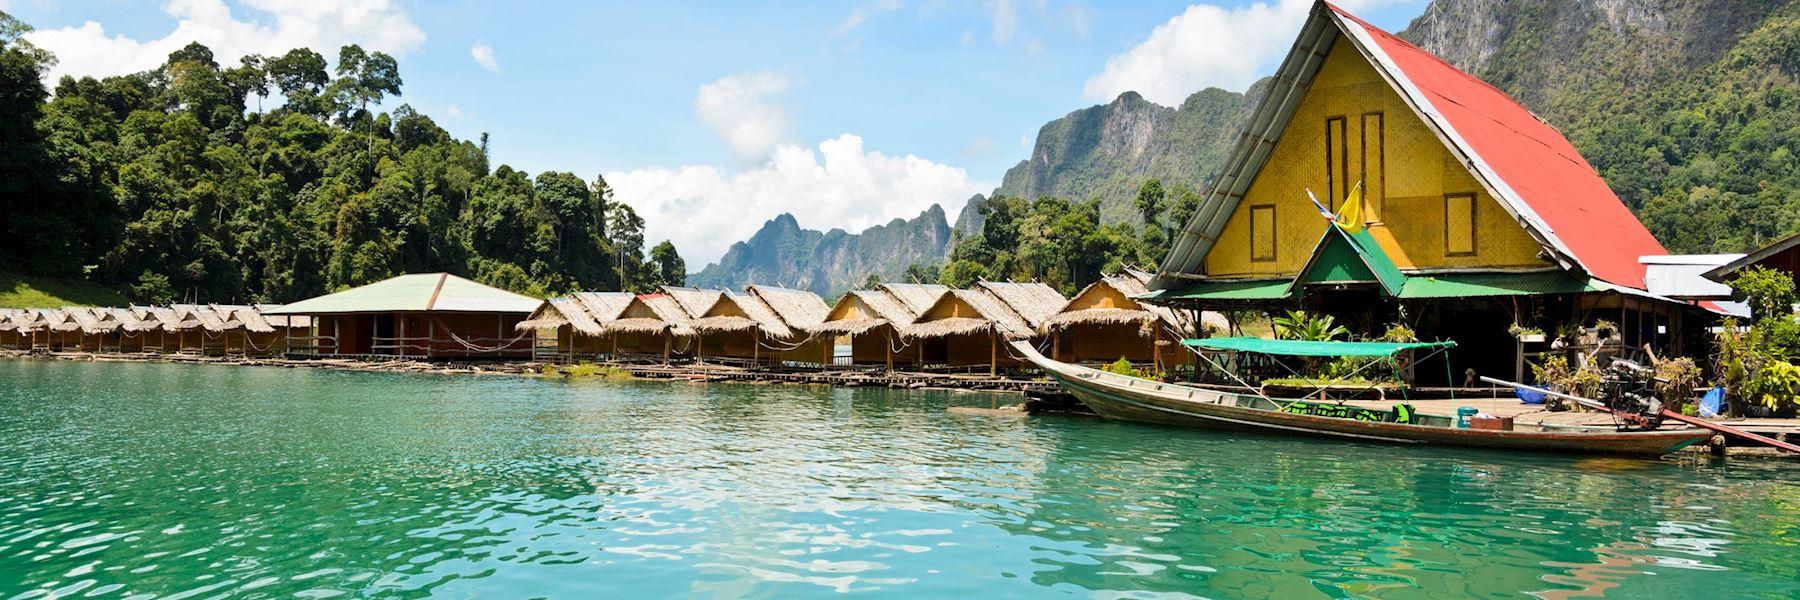 Visit Khao Sok National Park Thailand Audley Travel